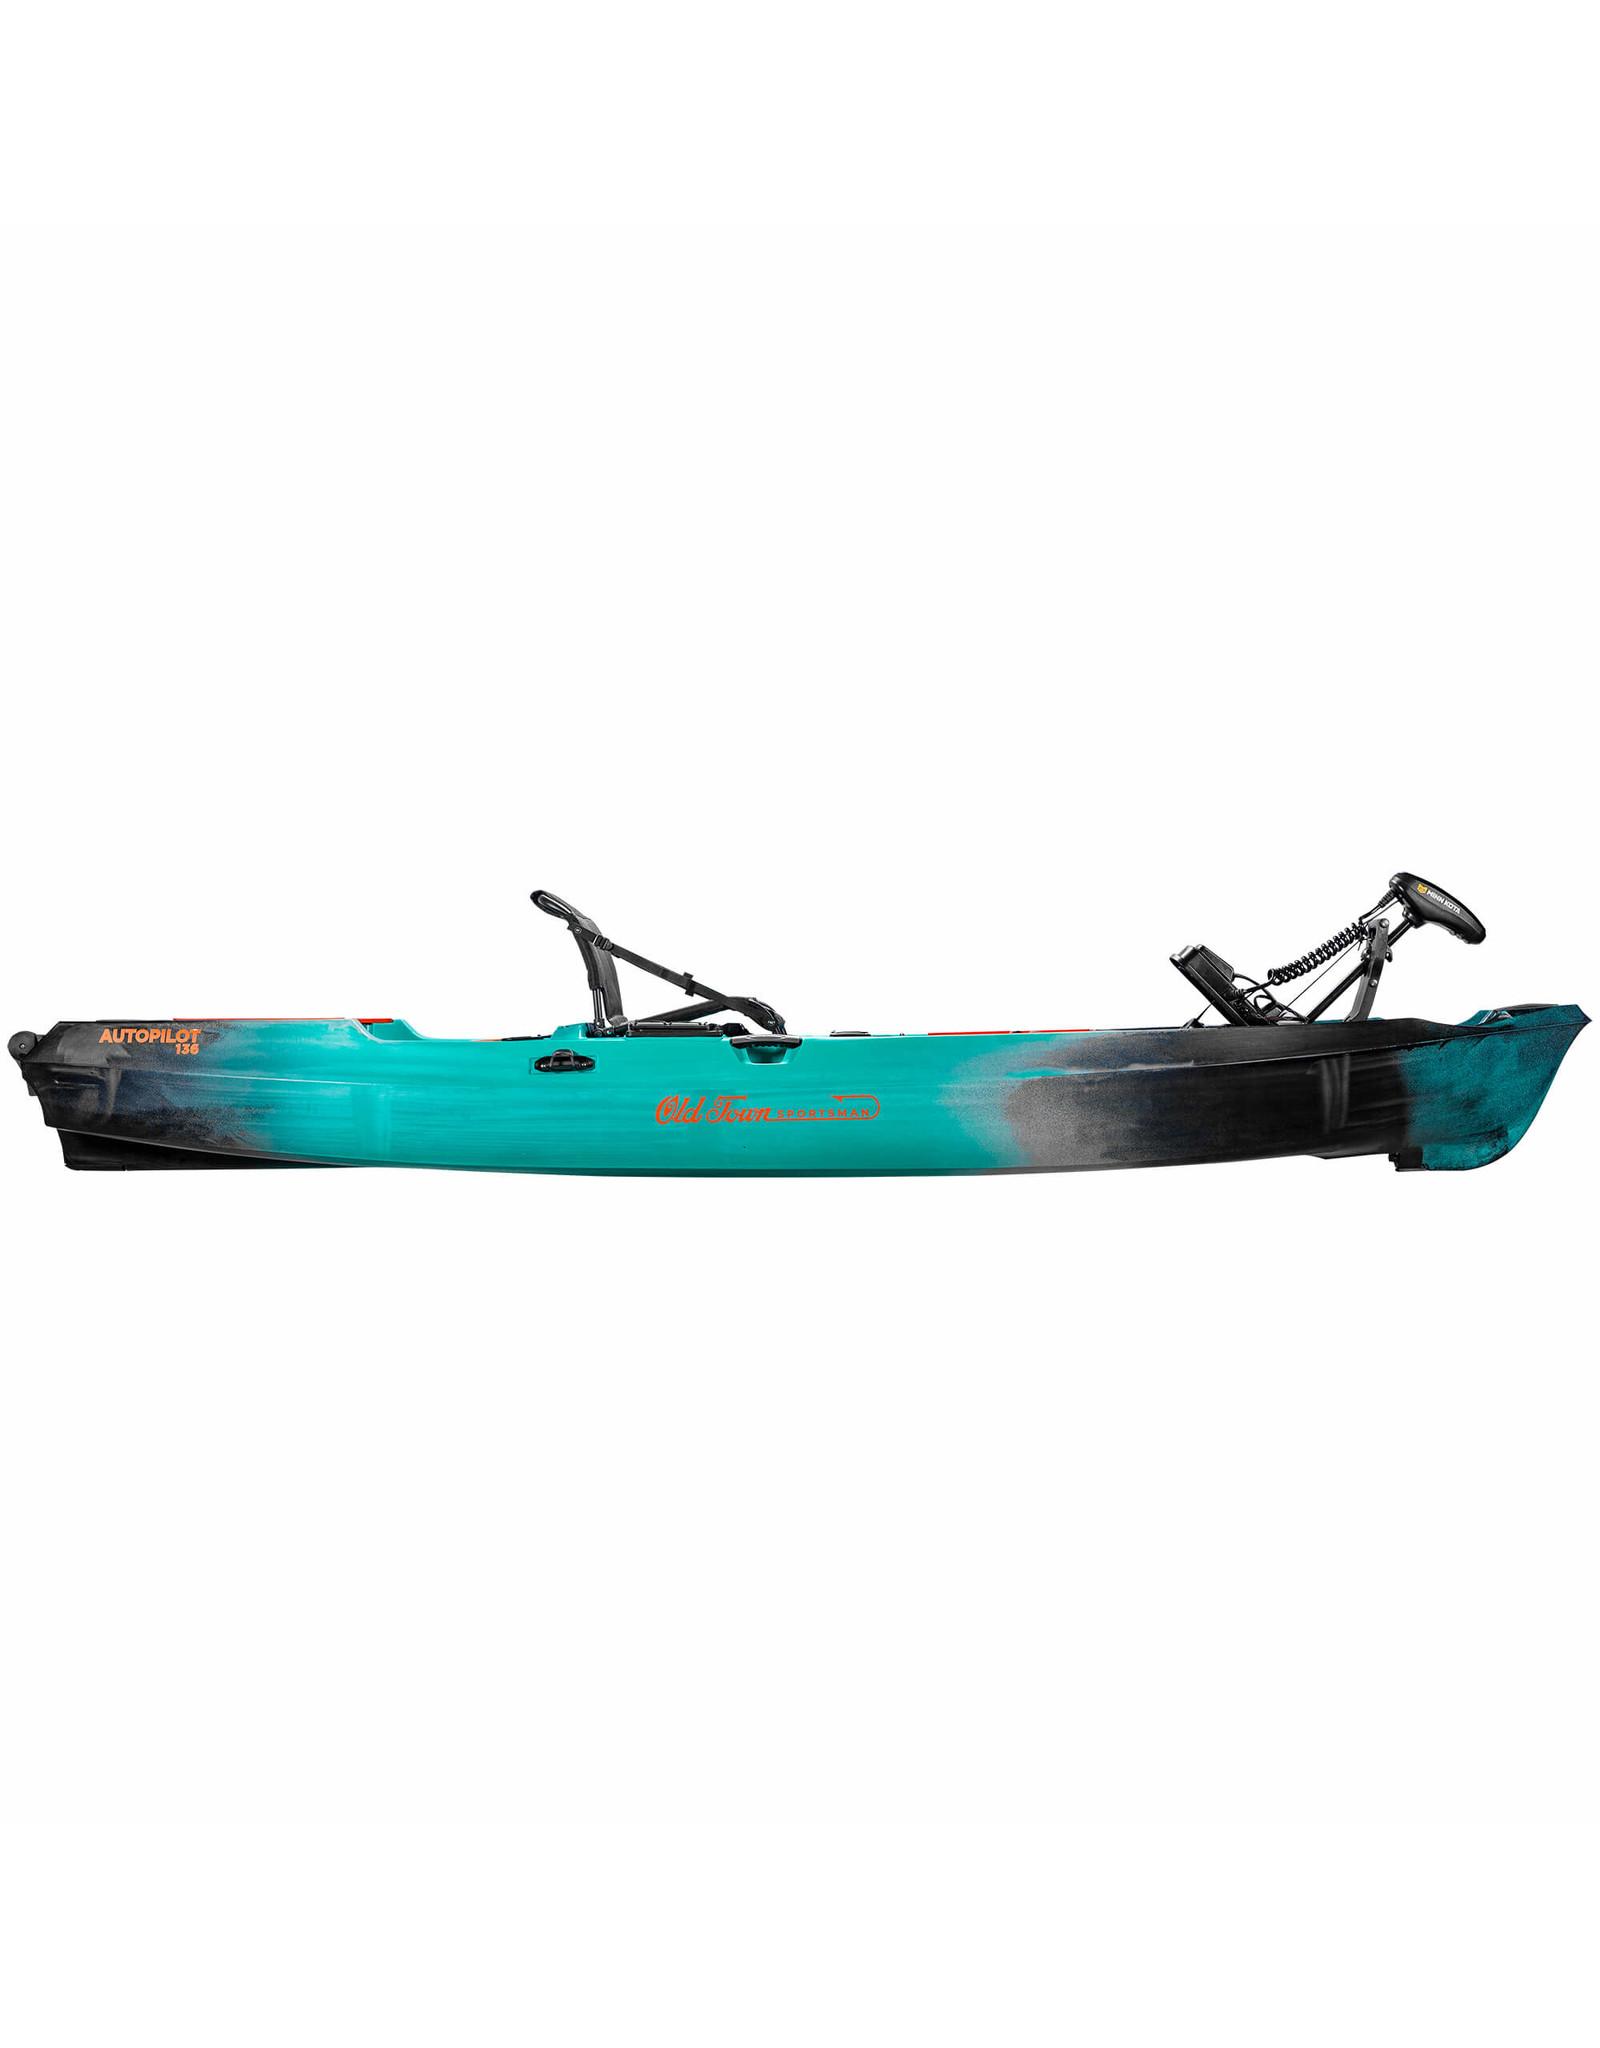 Old Town Old Town kayak Sportman AutoPilot 136